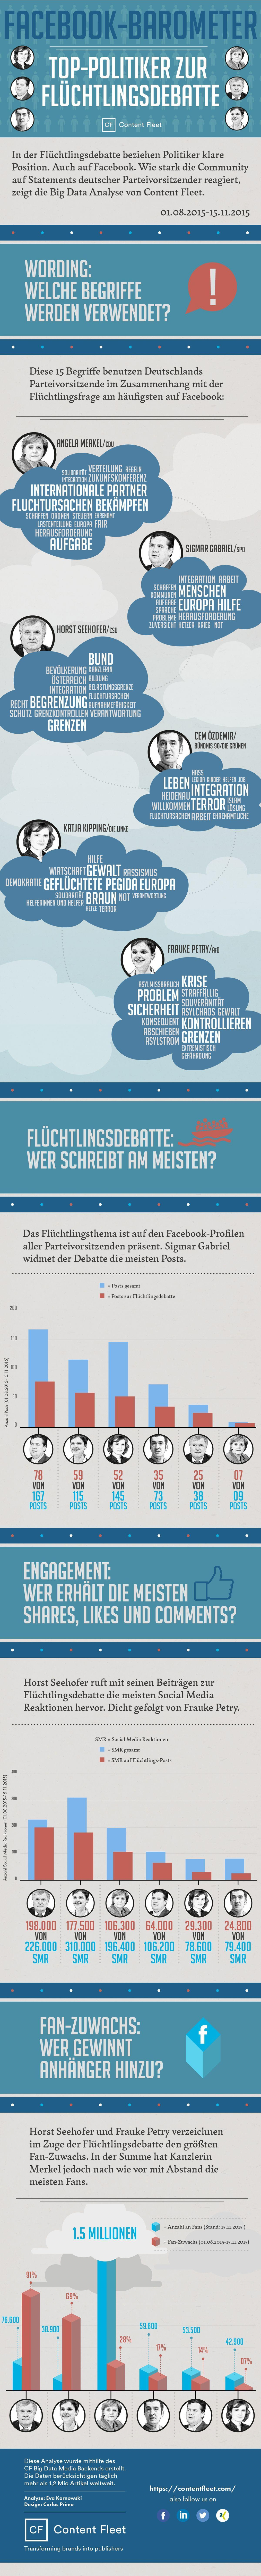 Ingografik-Flüchtlingsdebatte-Facebook-Parteivorsitzende